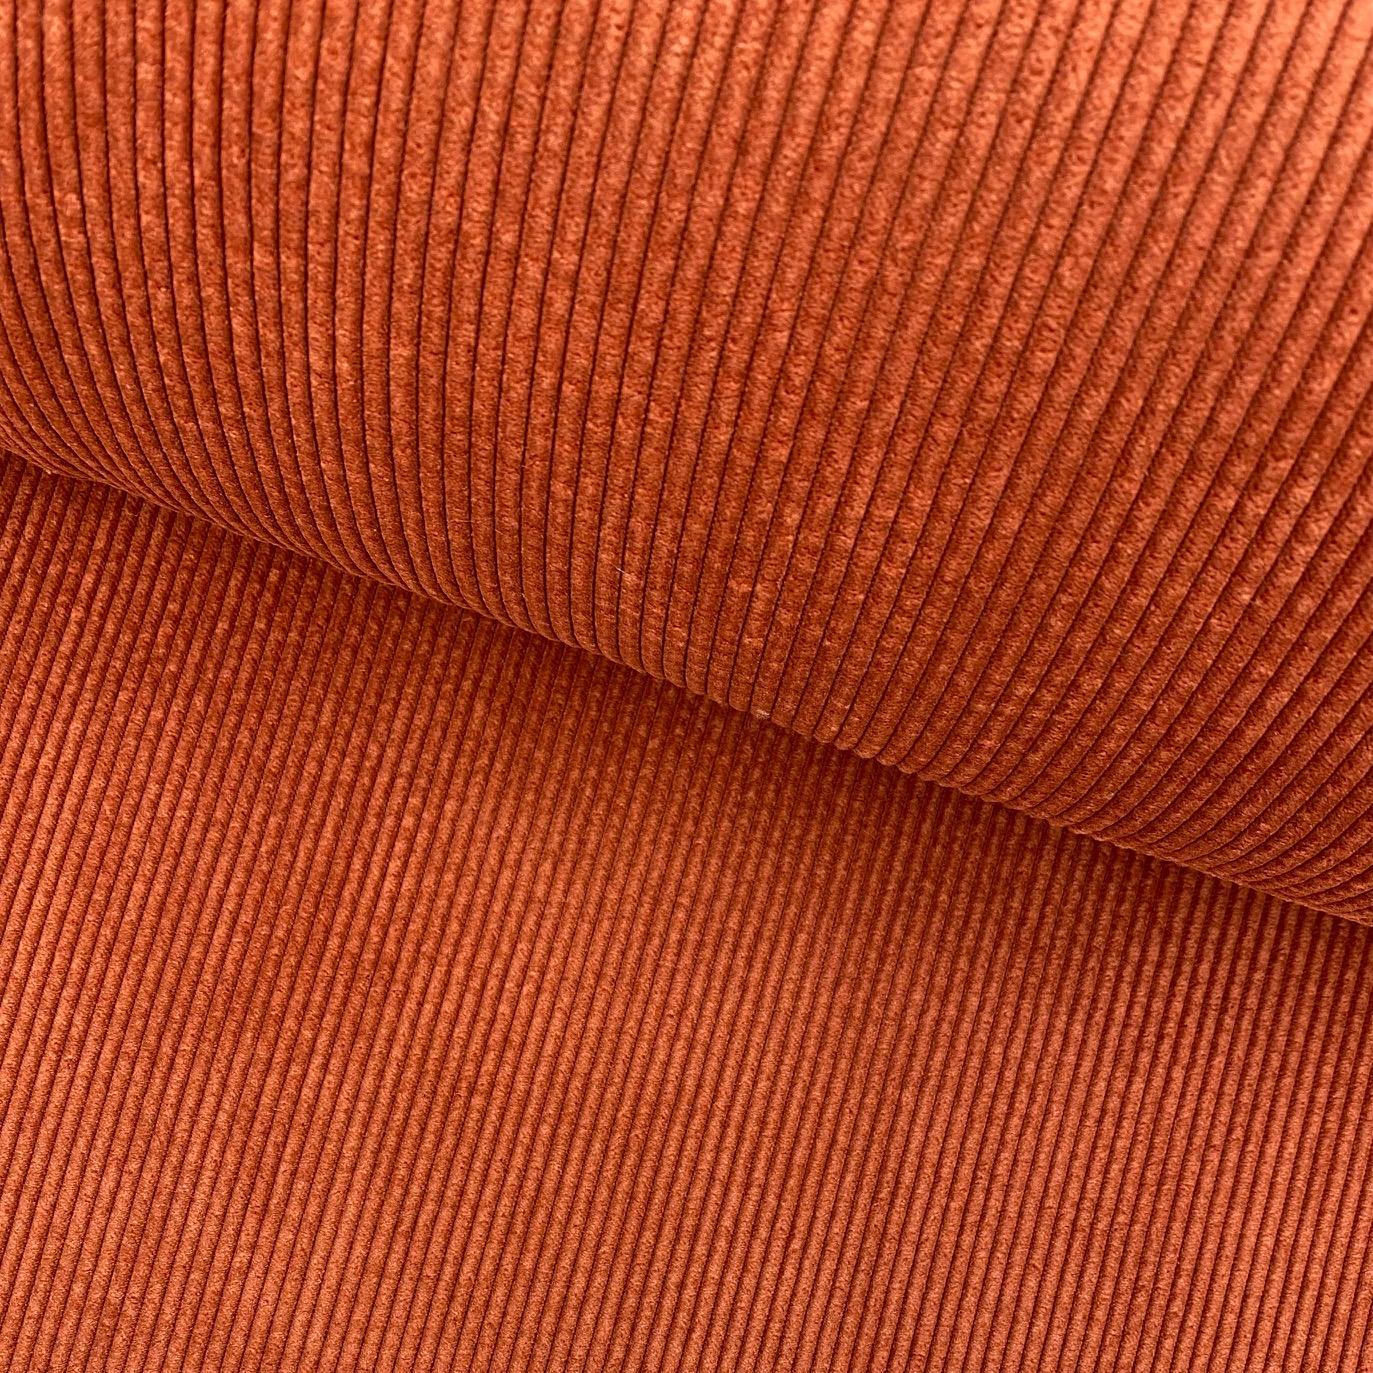 Cord mit Fellabseite, rostfarbe. Art. 132746